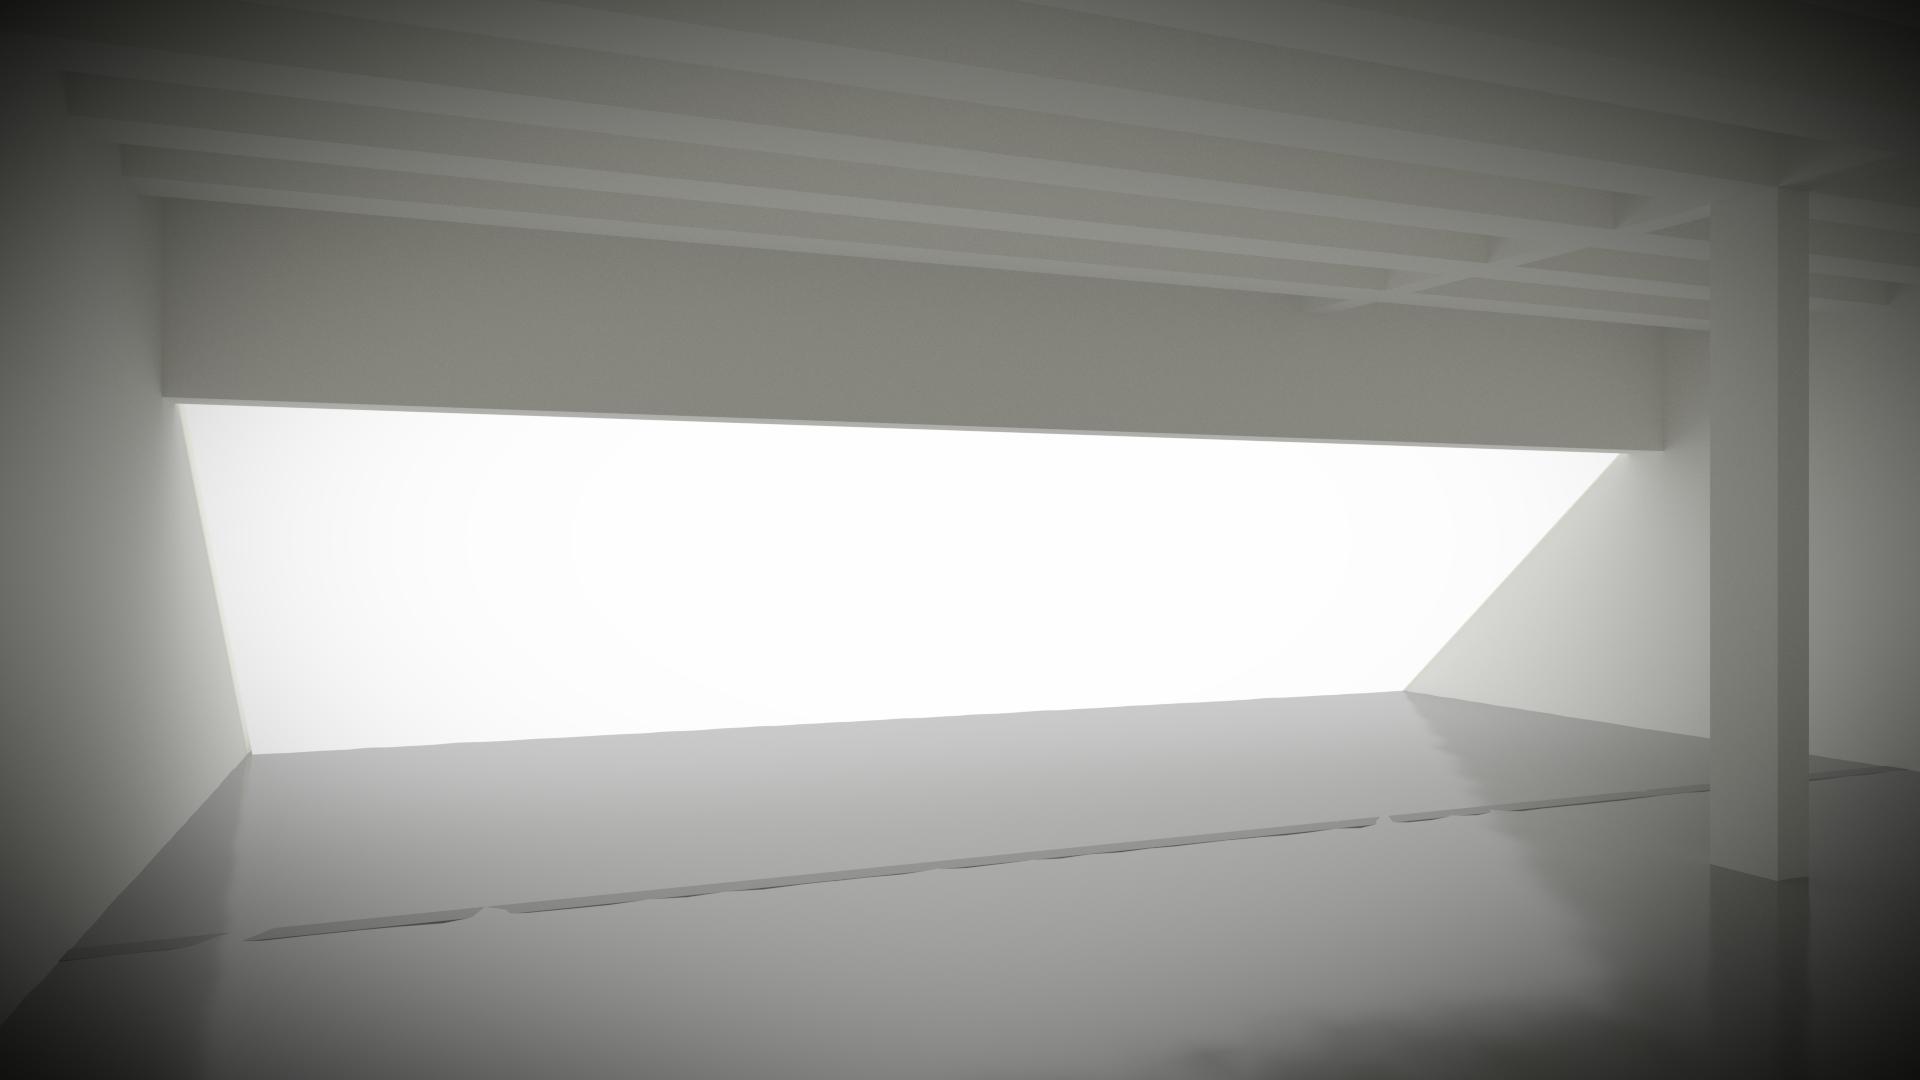 Neon3-RobertIrwin-slant-light-volume-1971-1080HD.png